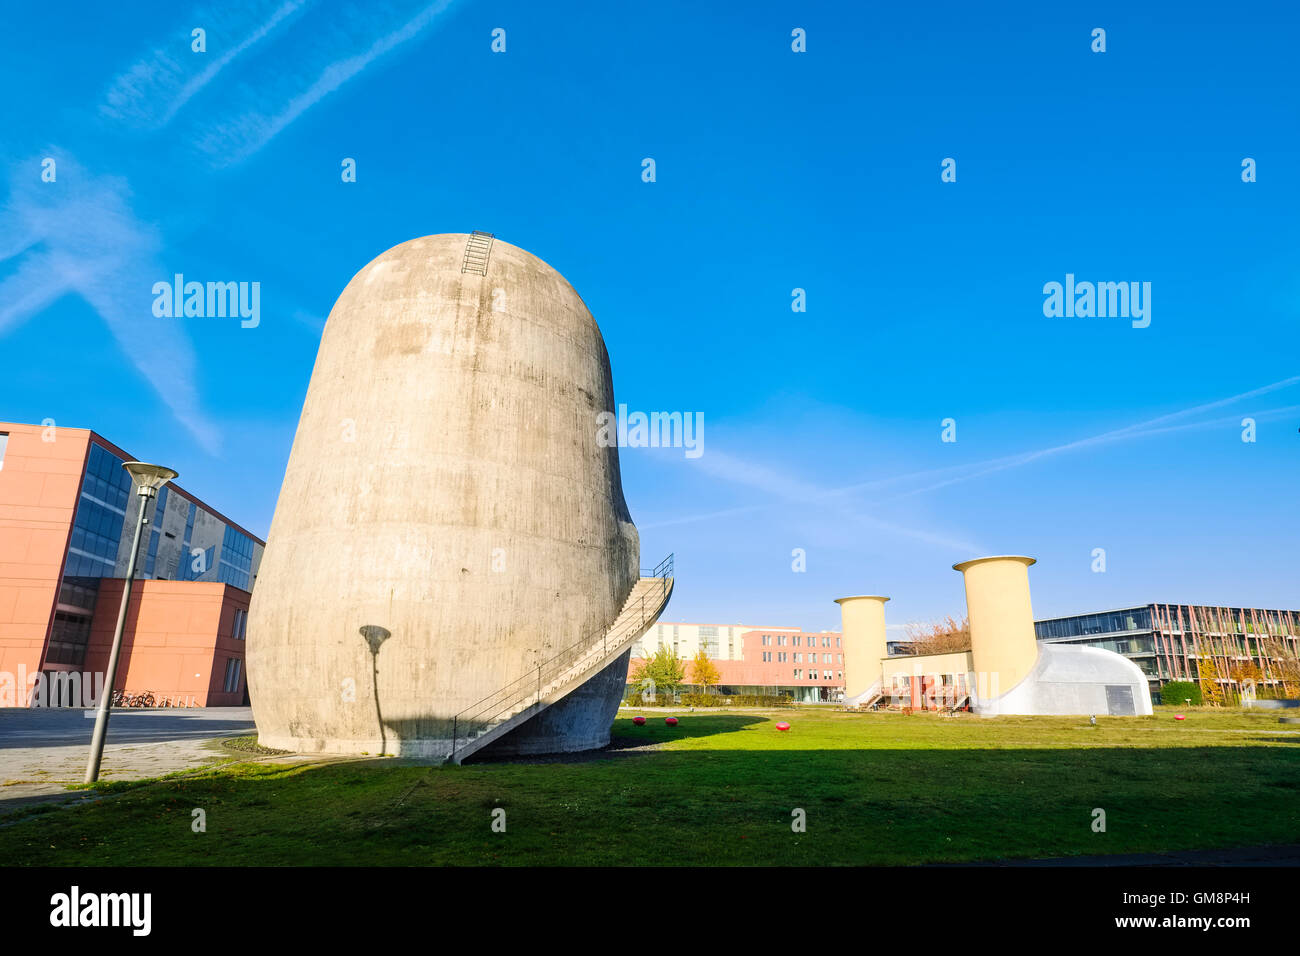 Trudelturm, Aerodynamic Park, Berlin-Adlershof, Germany Stock Photo